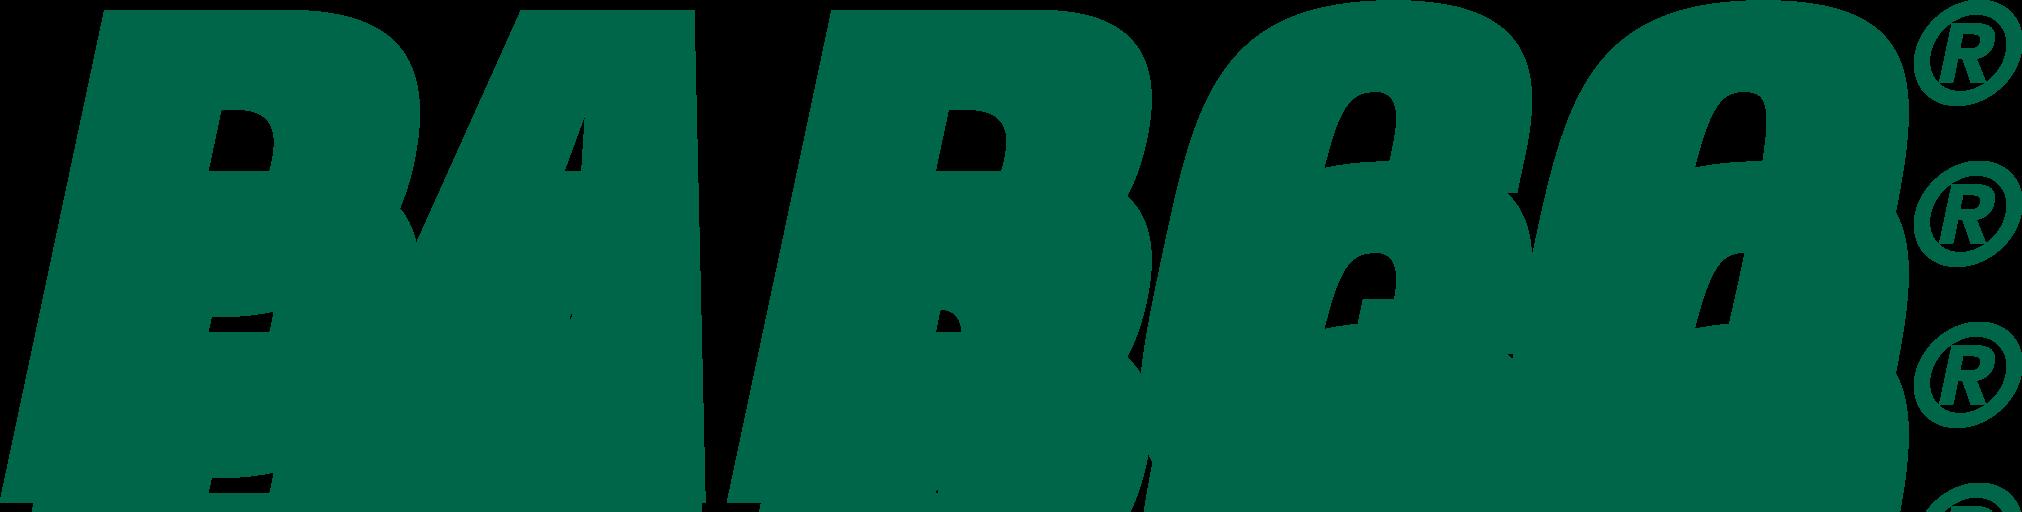 Parco Logo PNG